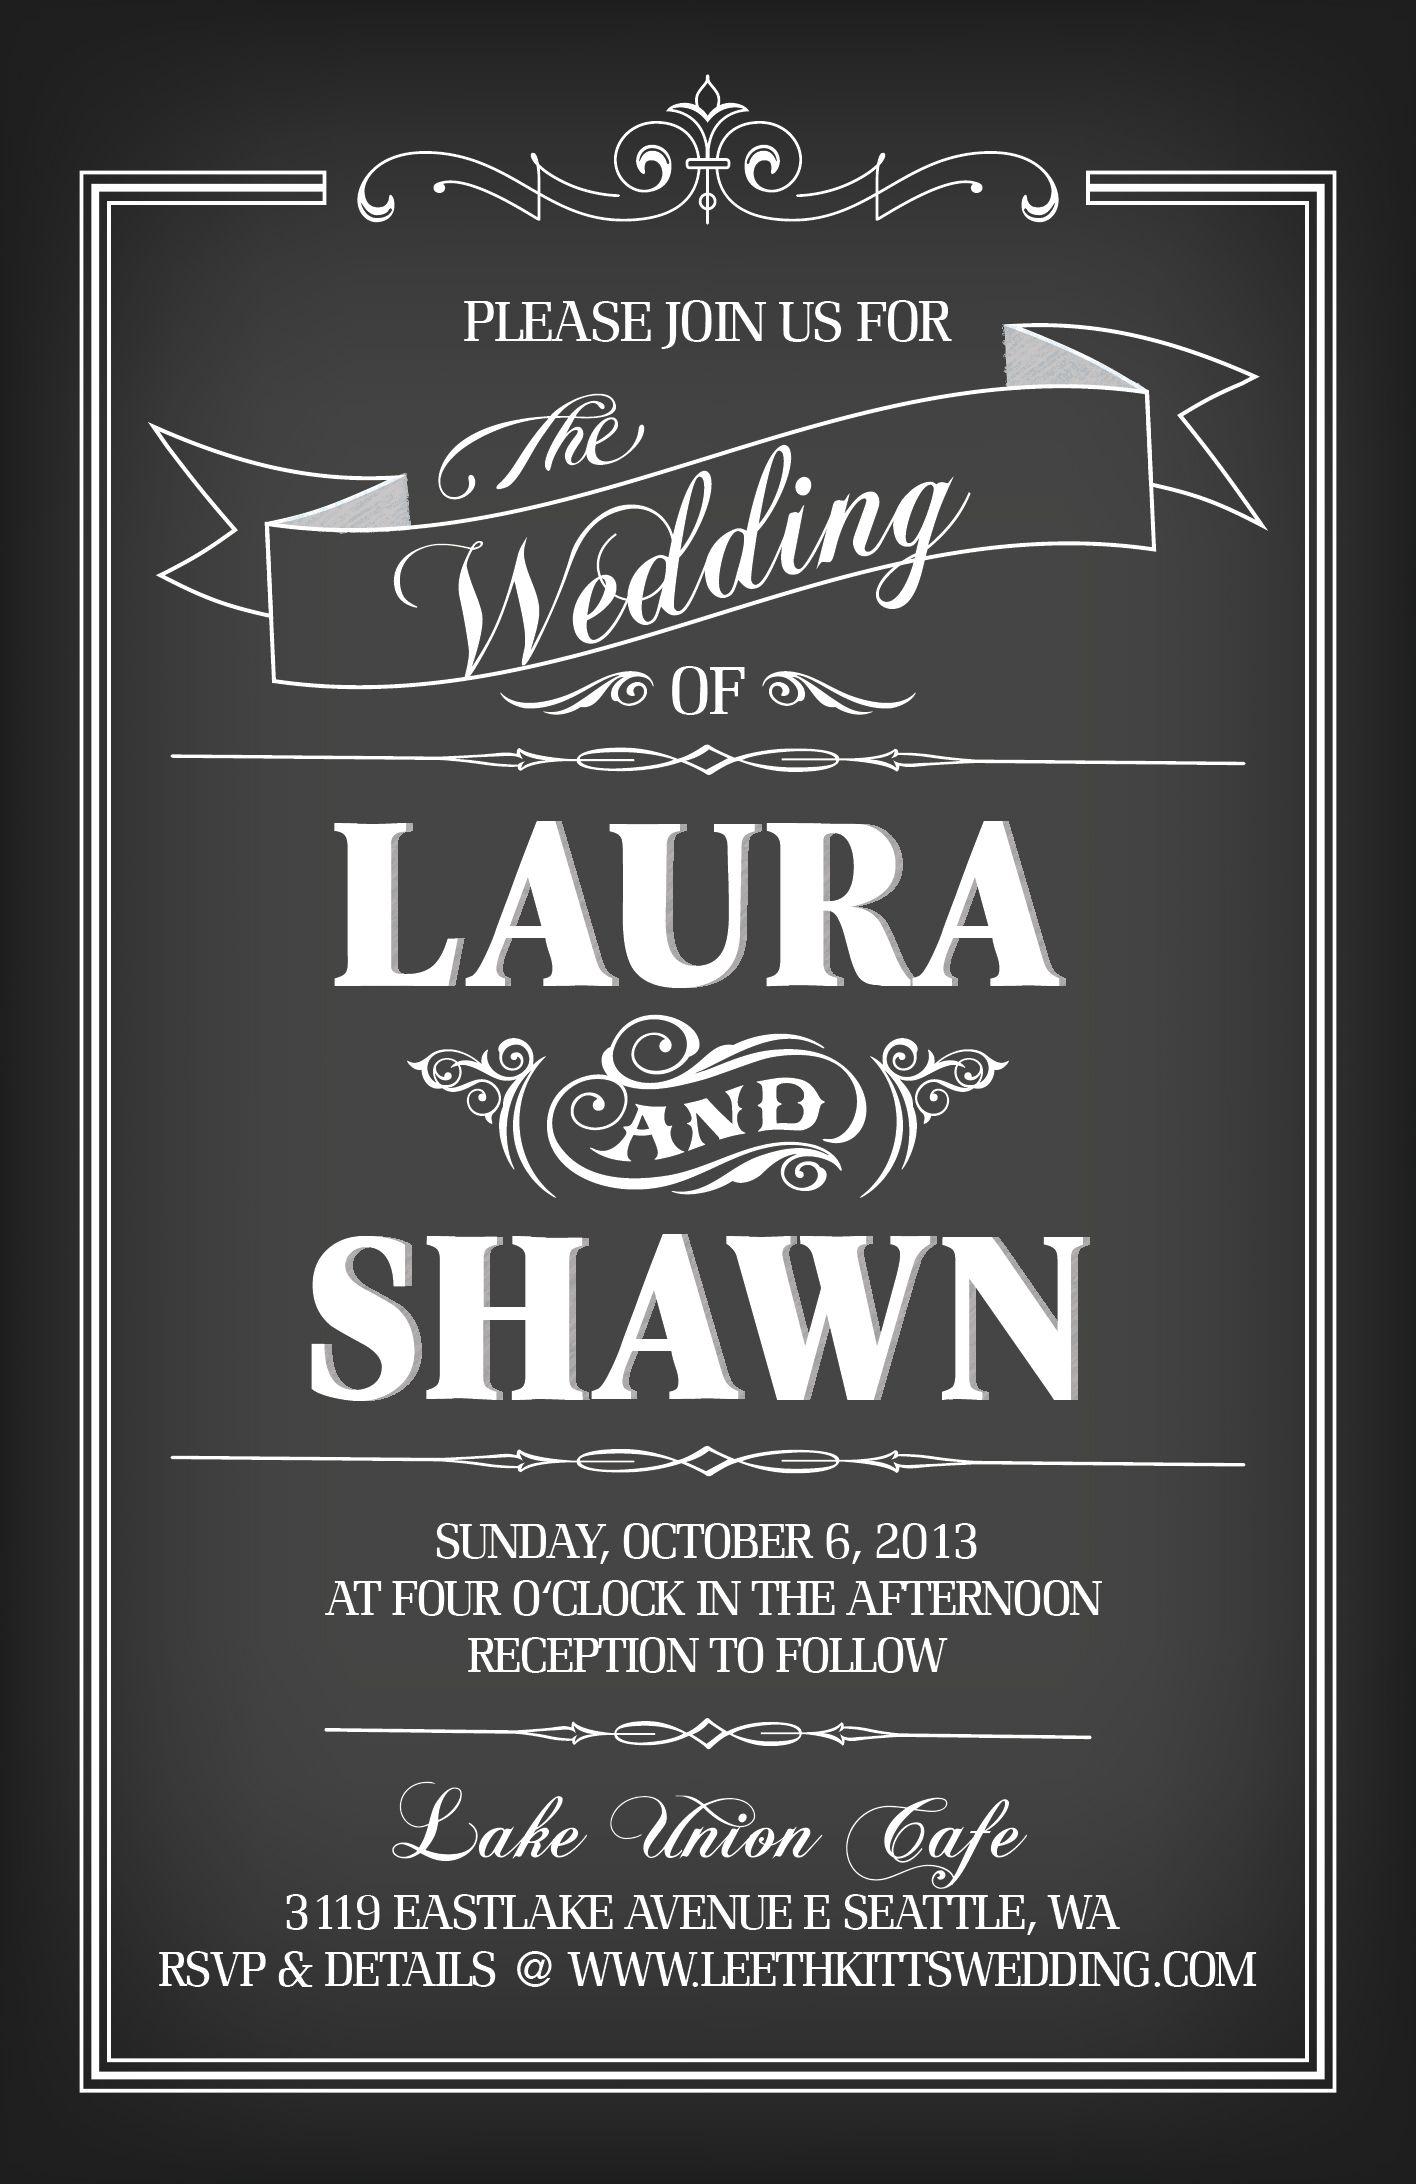 Wedding Invitation - chalkboard style. Template ordered through Etsy ...